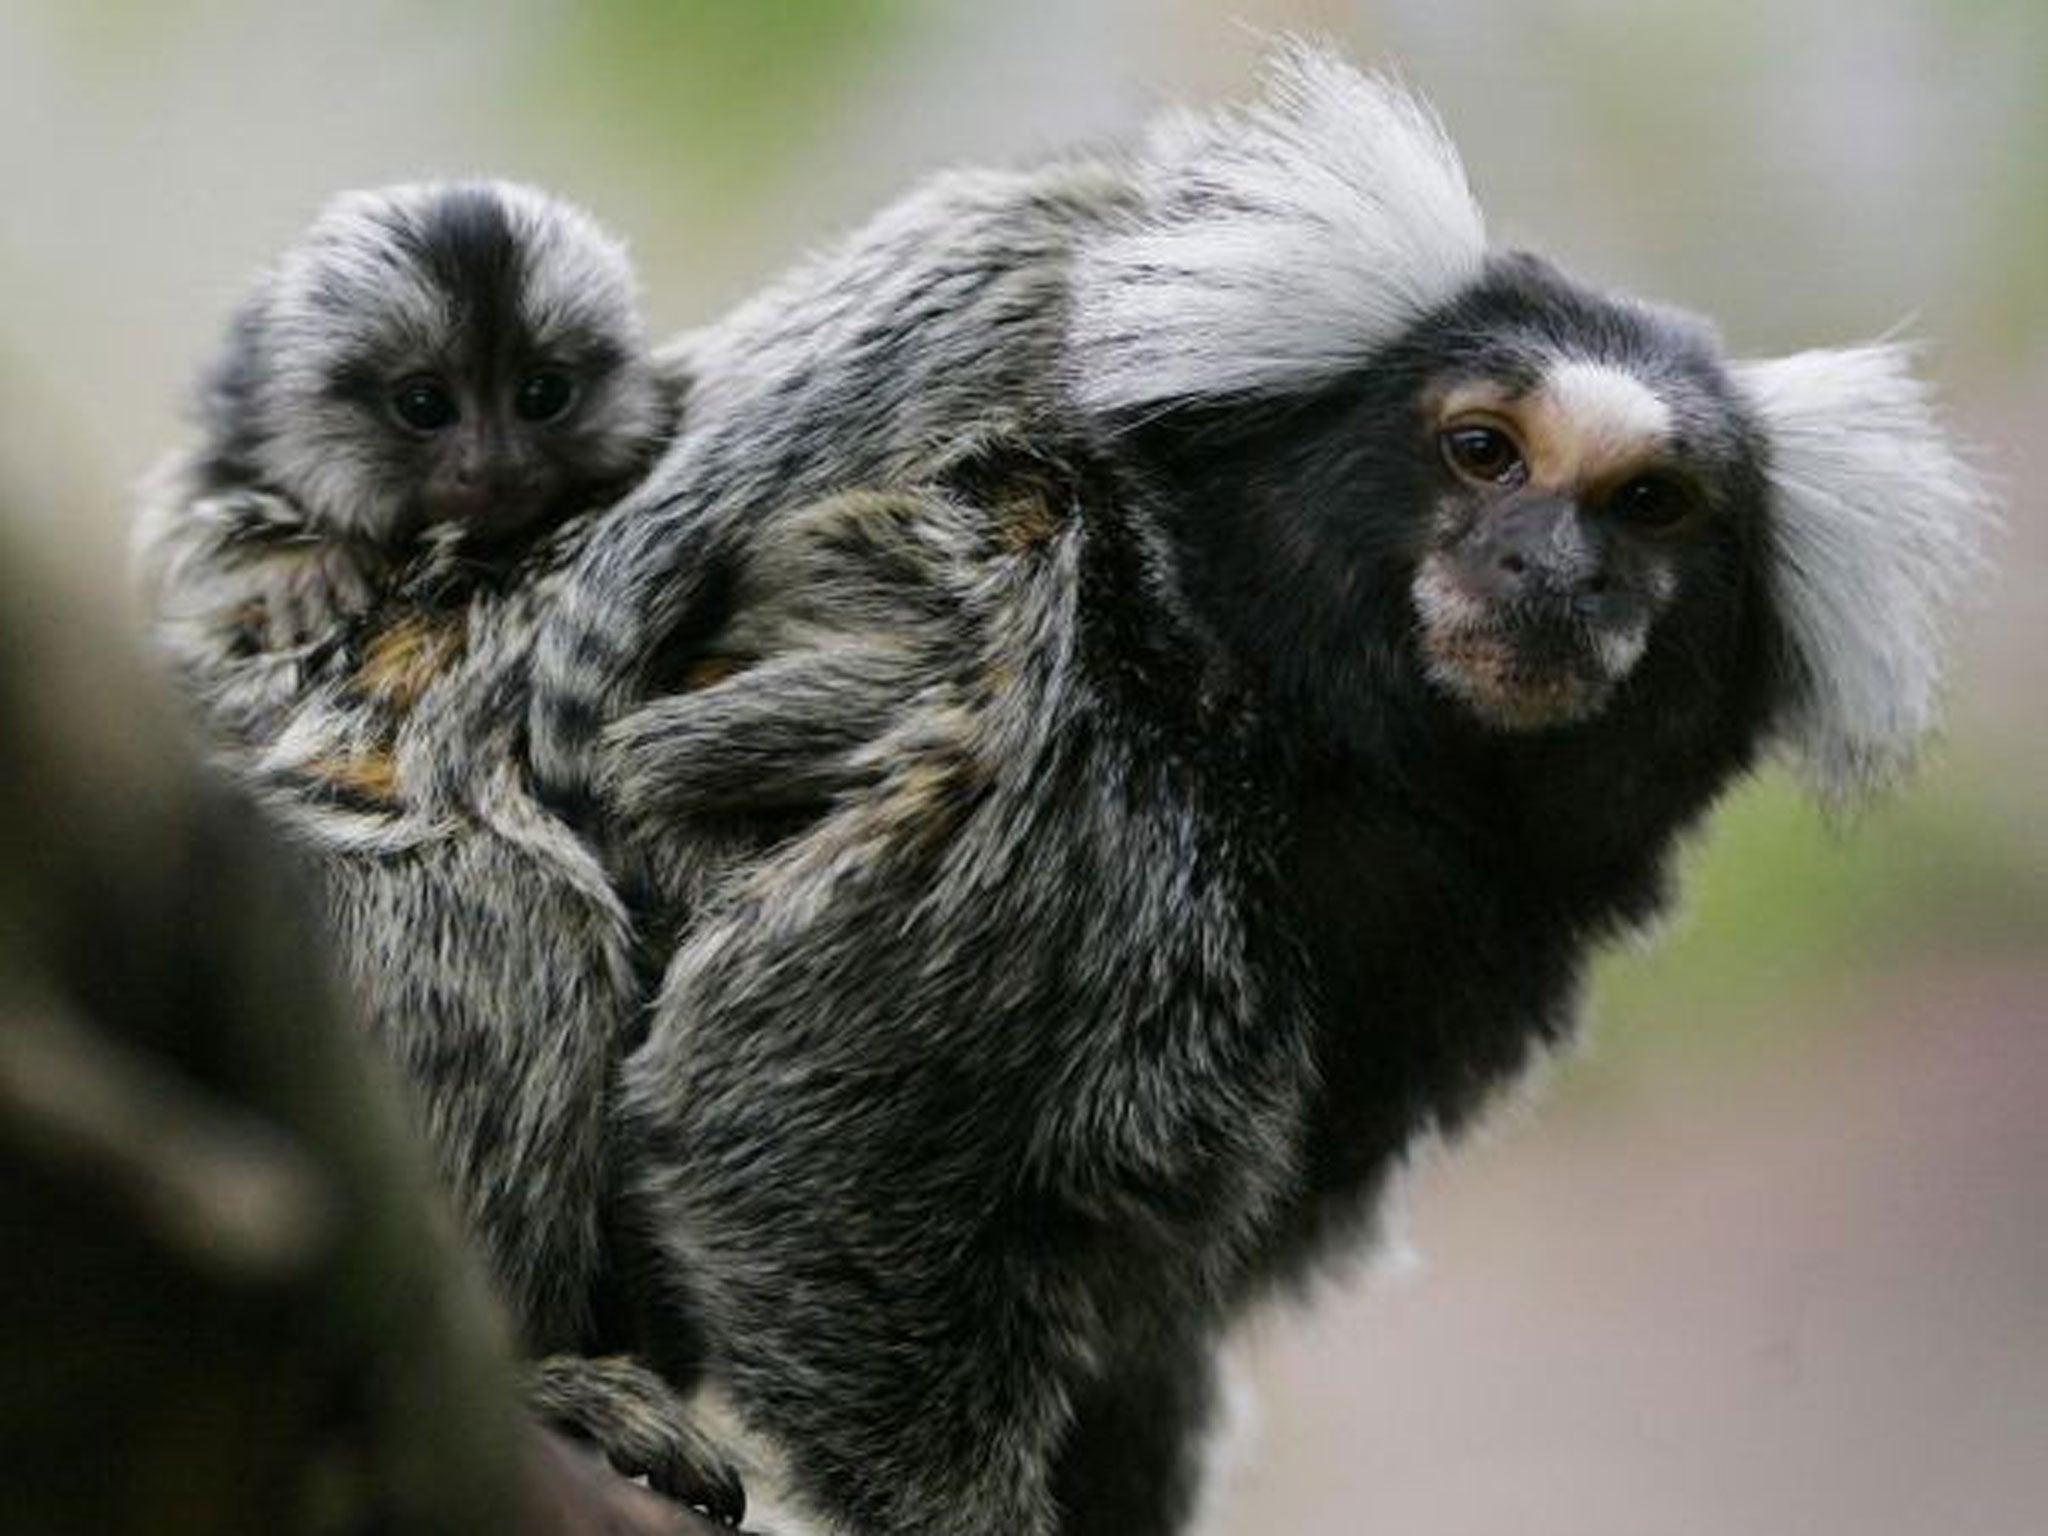 Cheeky monkey girl wrestling music piercings hair dying concert